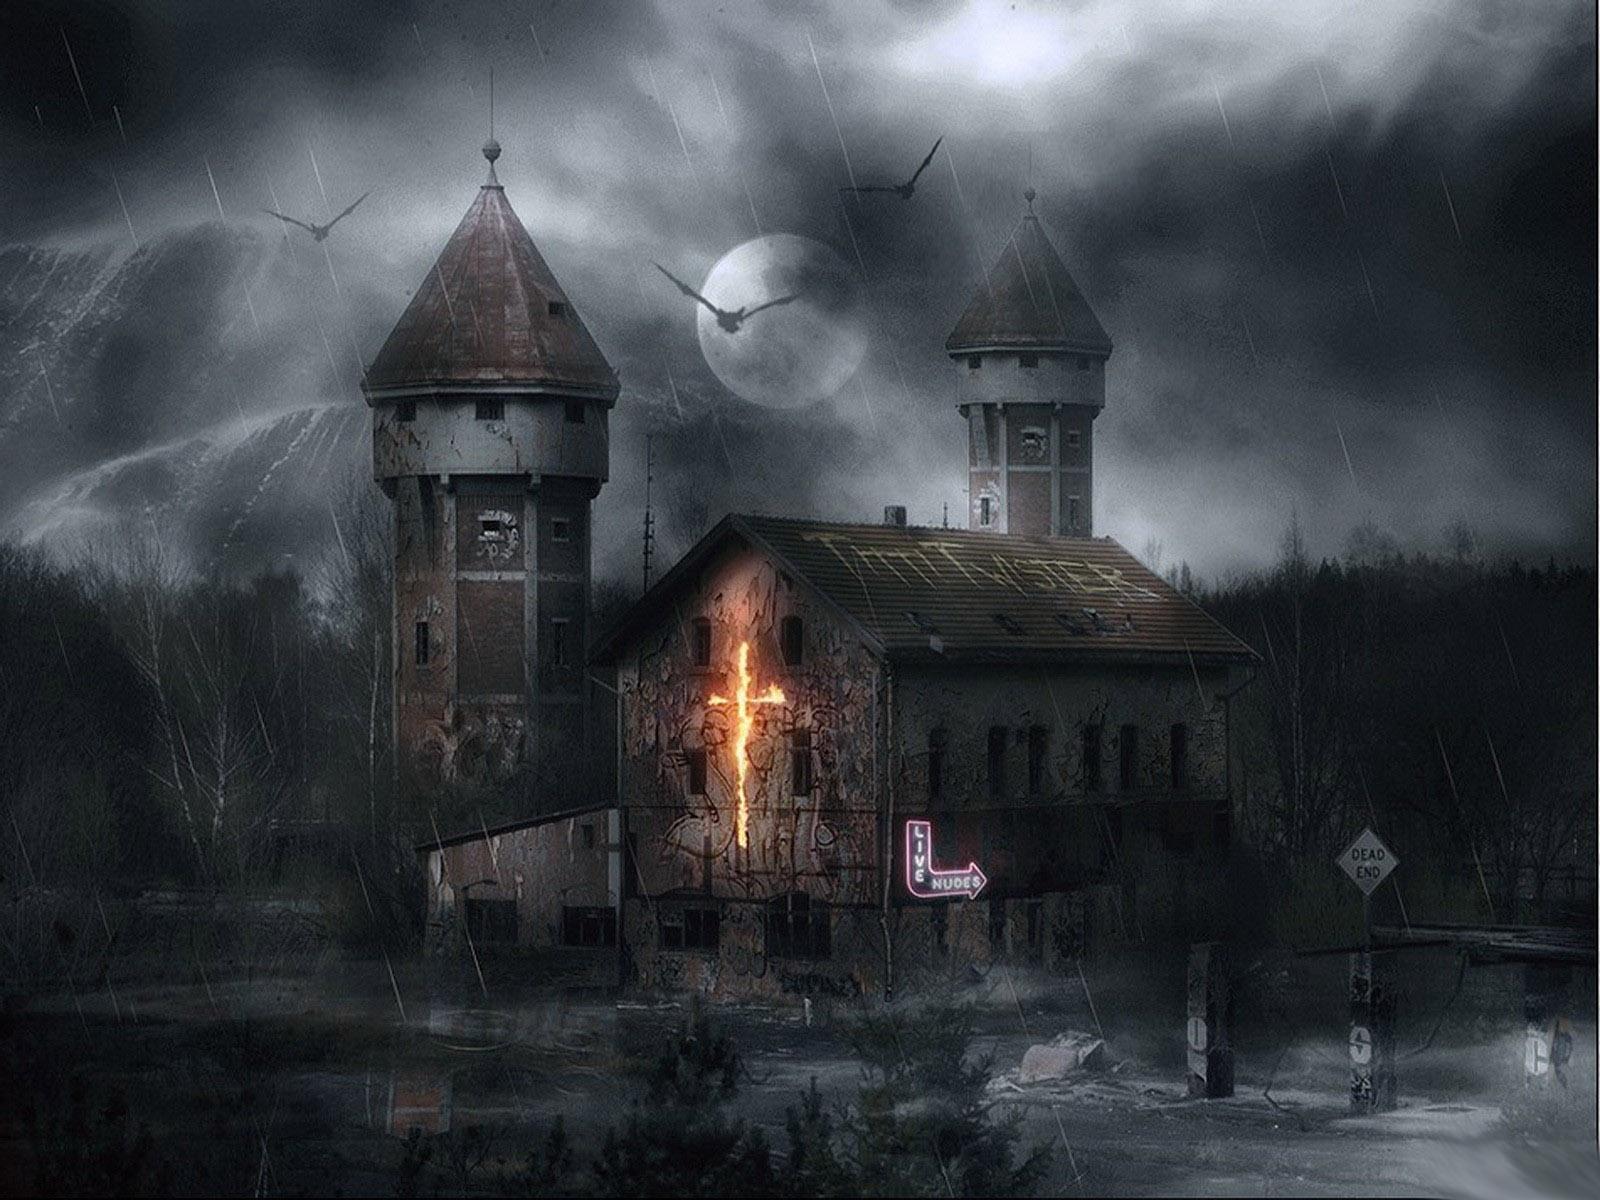 haunted house 1600x1200